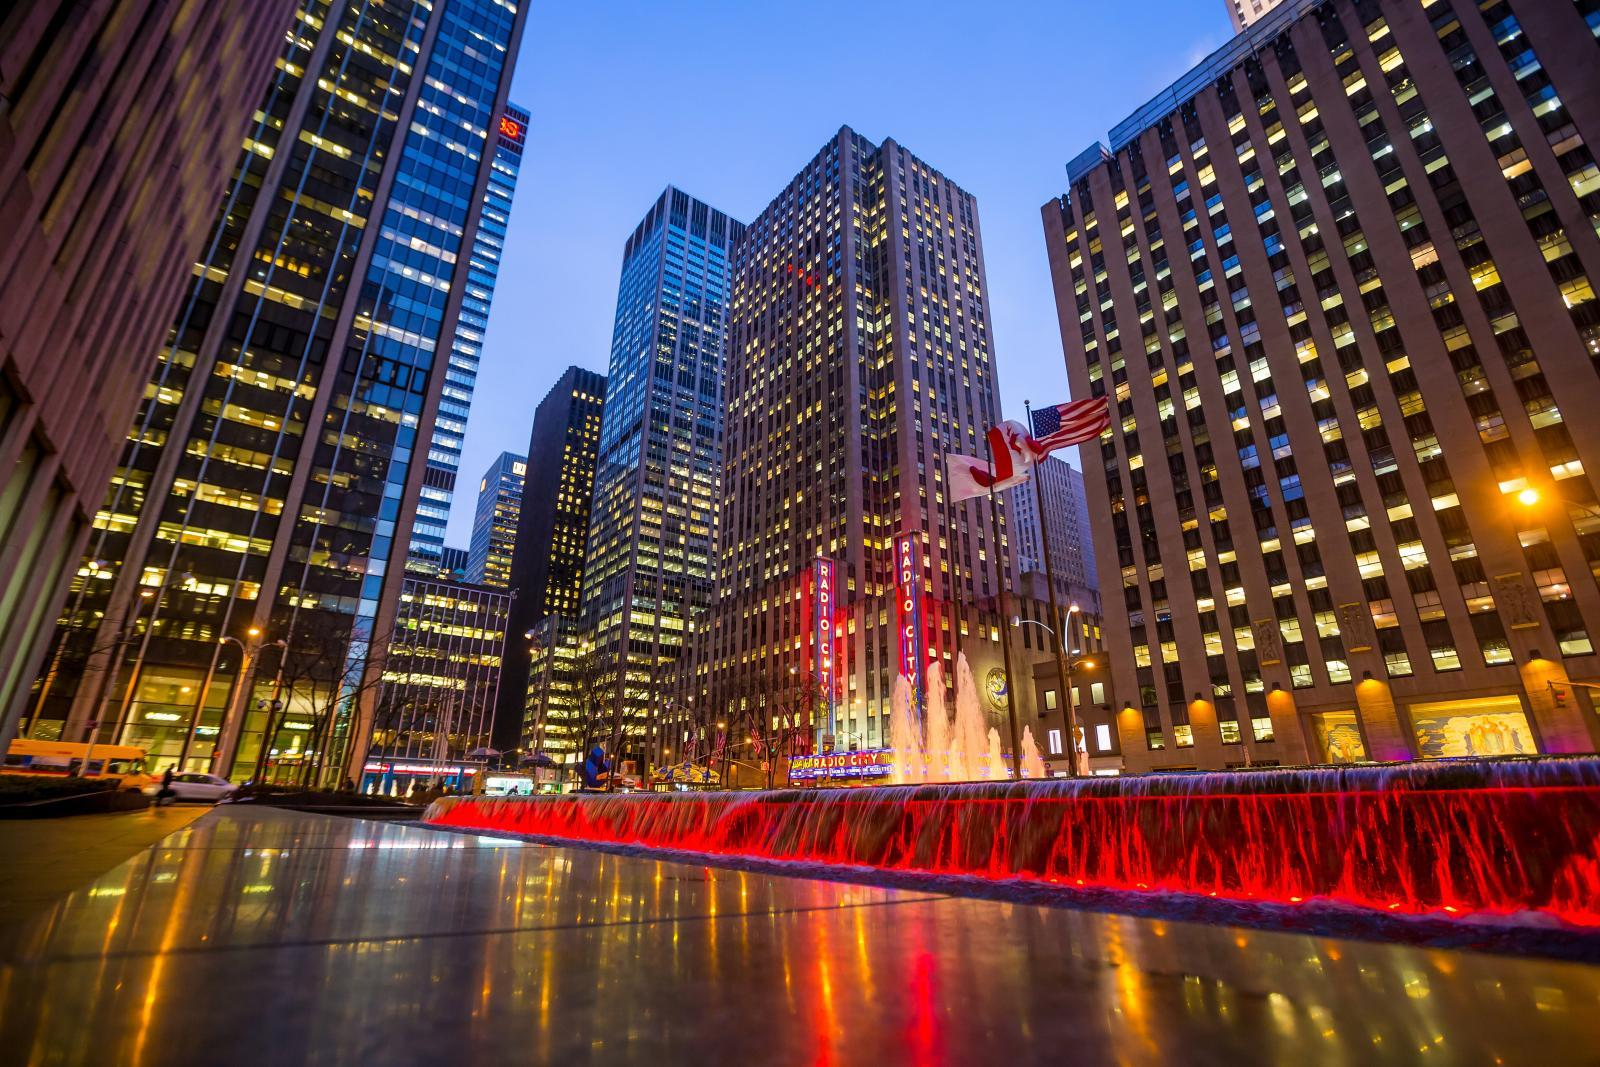 Radio City Music Hall Rockefeller Center